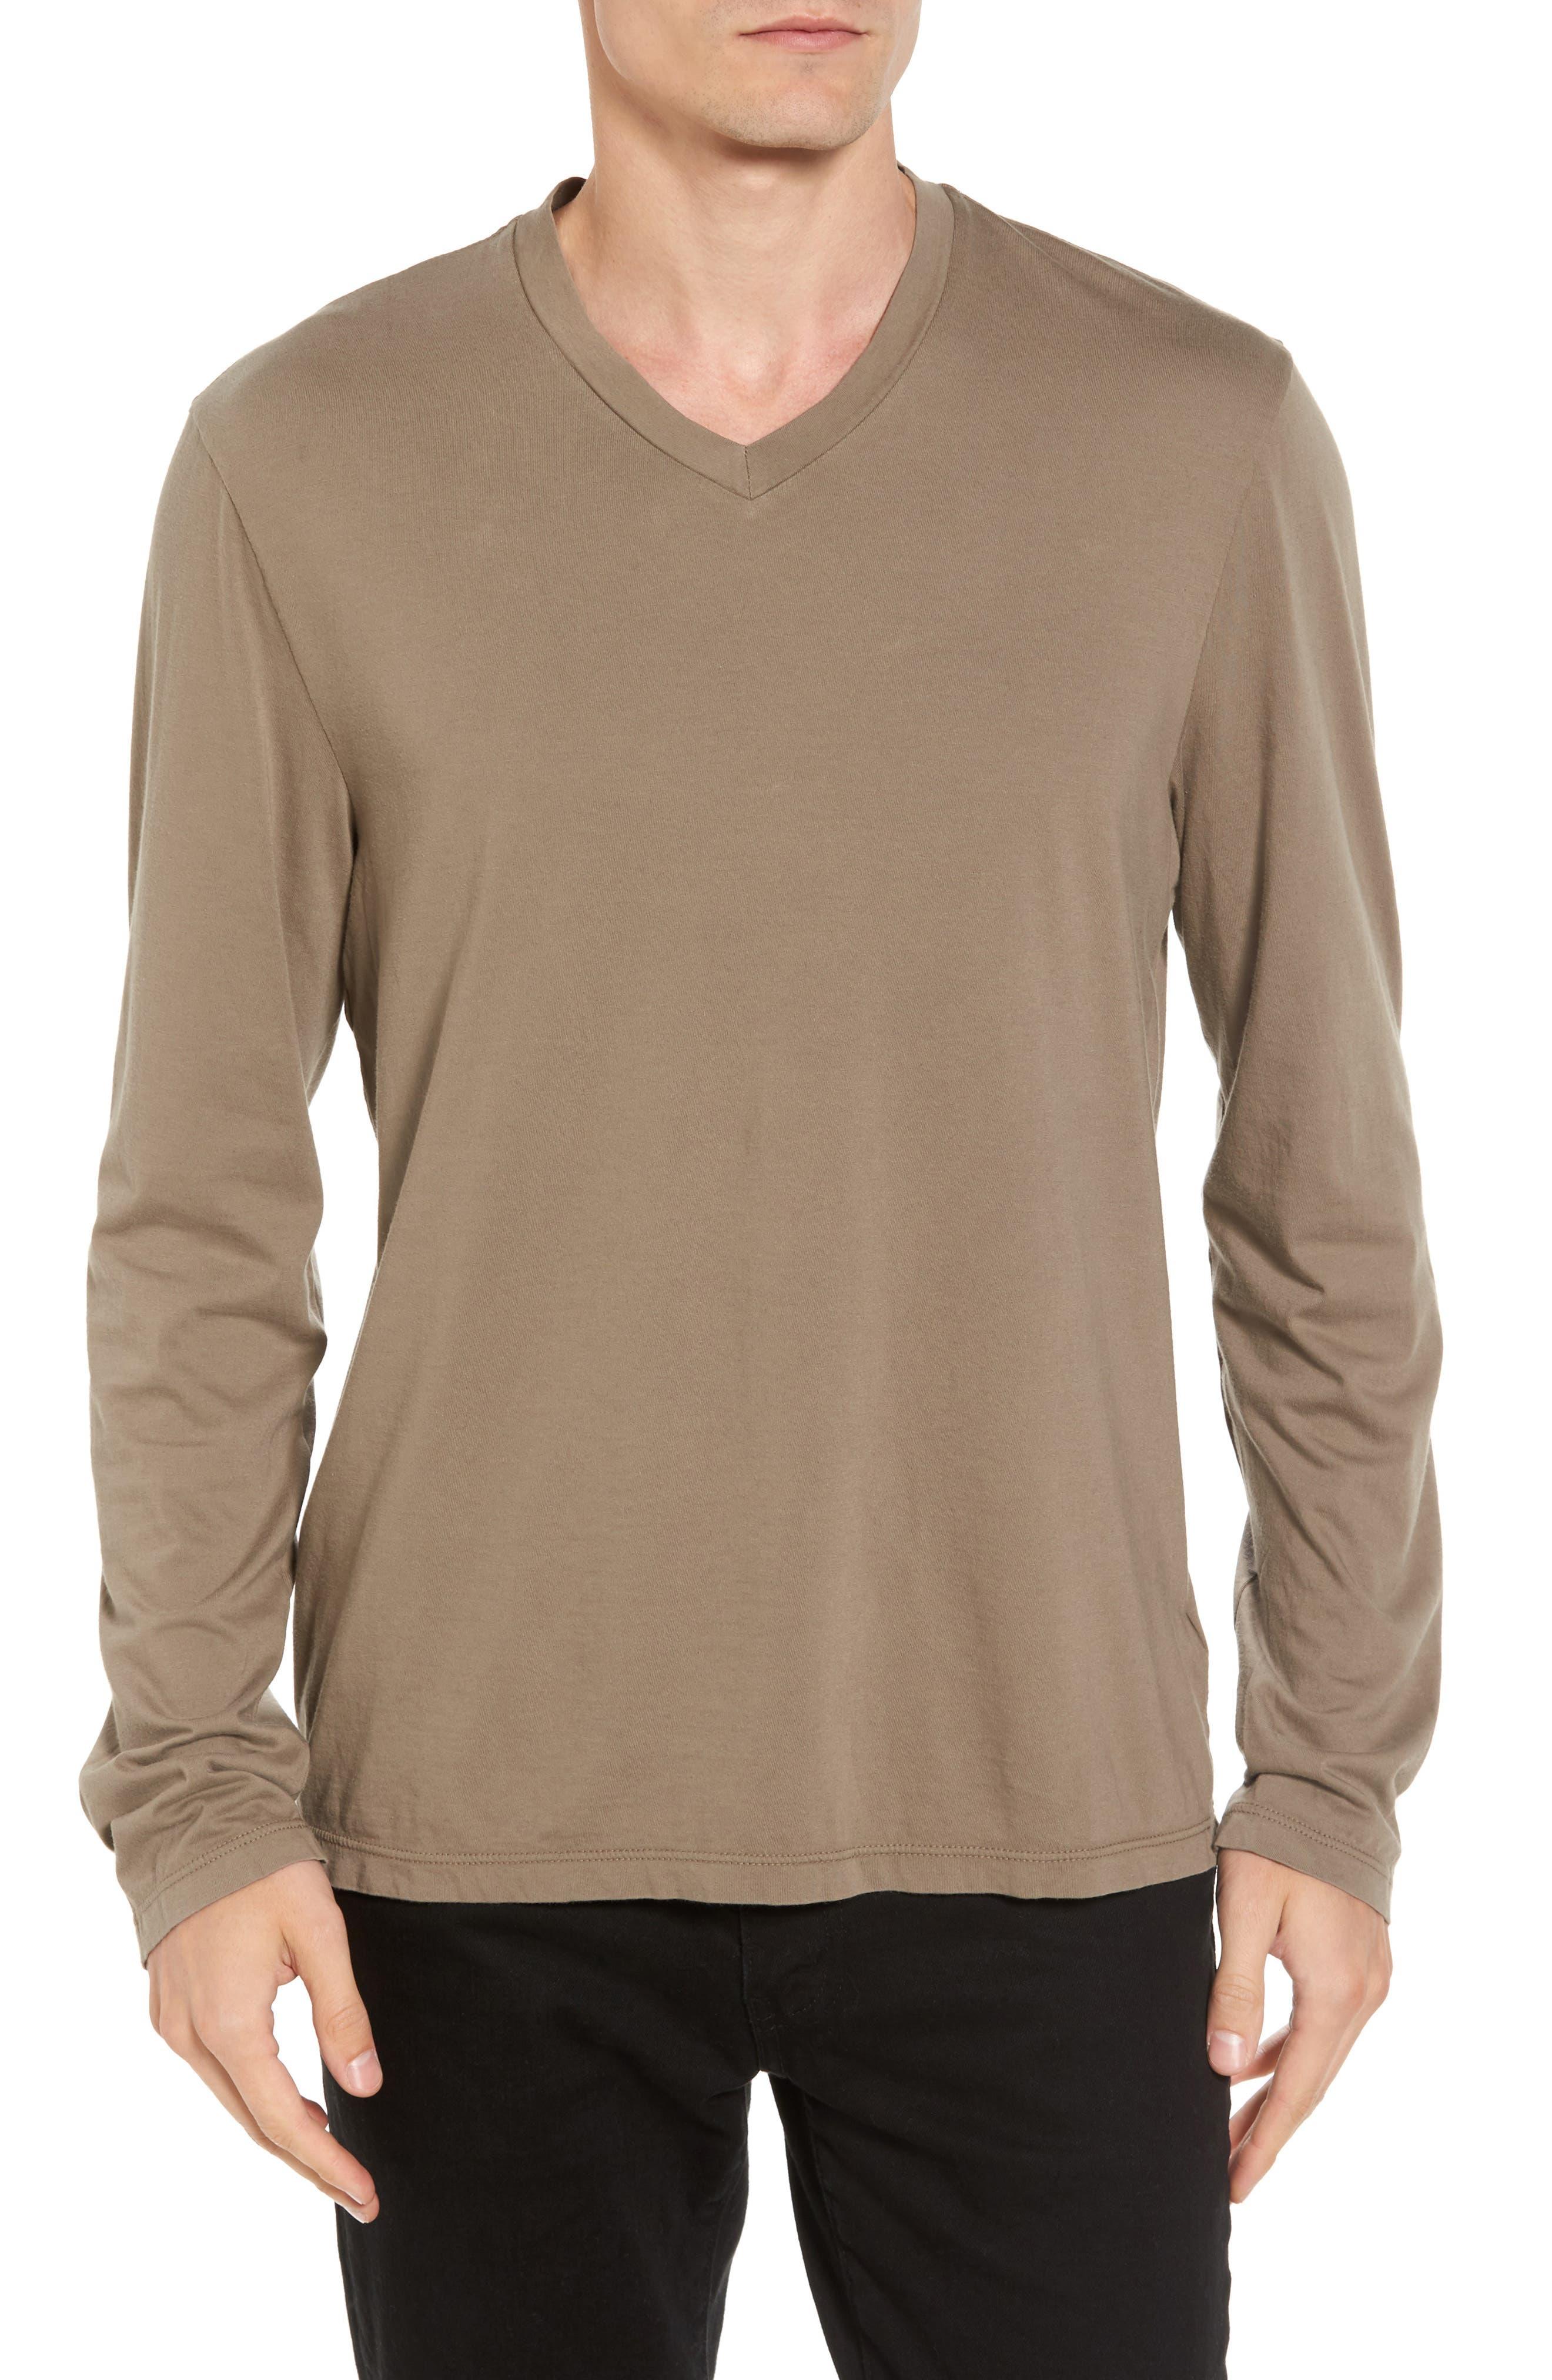 Suvin V-Neck Sweatshirt,                         Main,                         color, Ammo